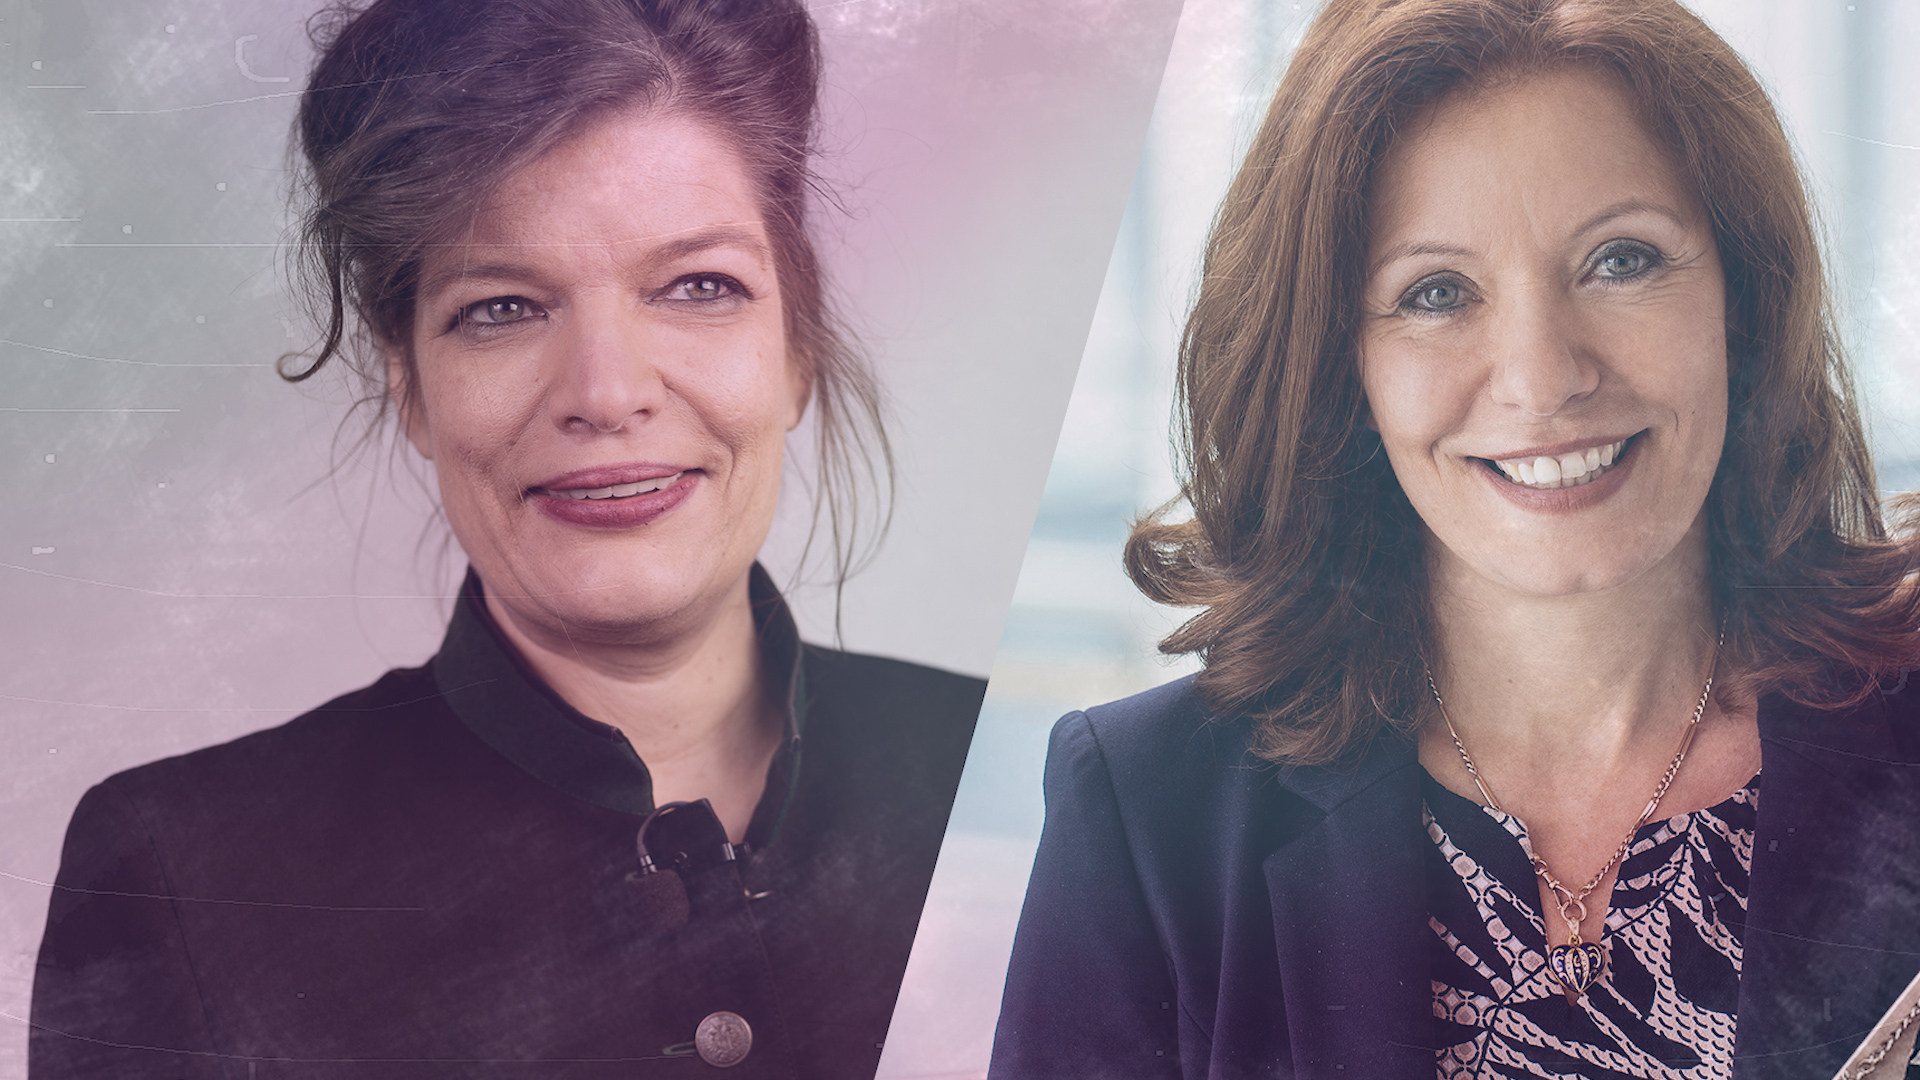 Talk im Schloss – Evelyn Kölldorfer-Leitgeb im Gespräch mit Esther Matolycz